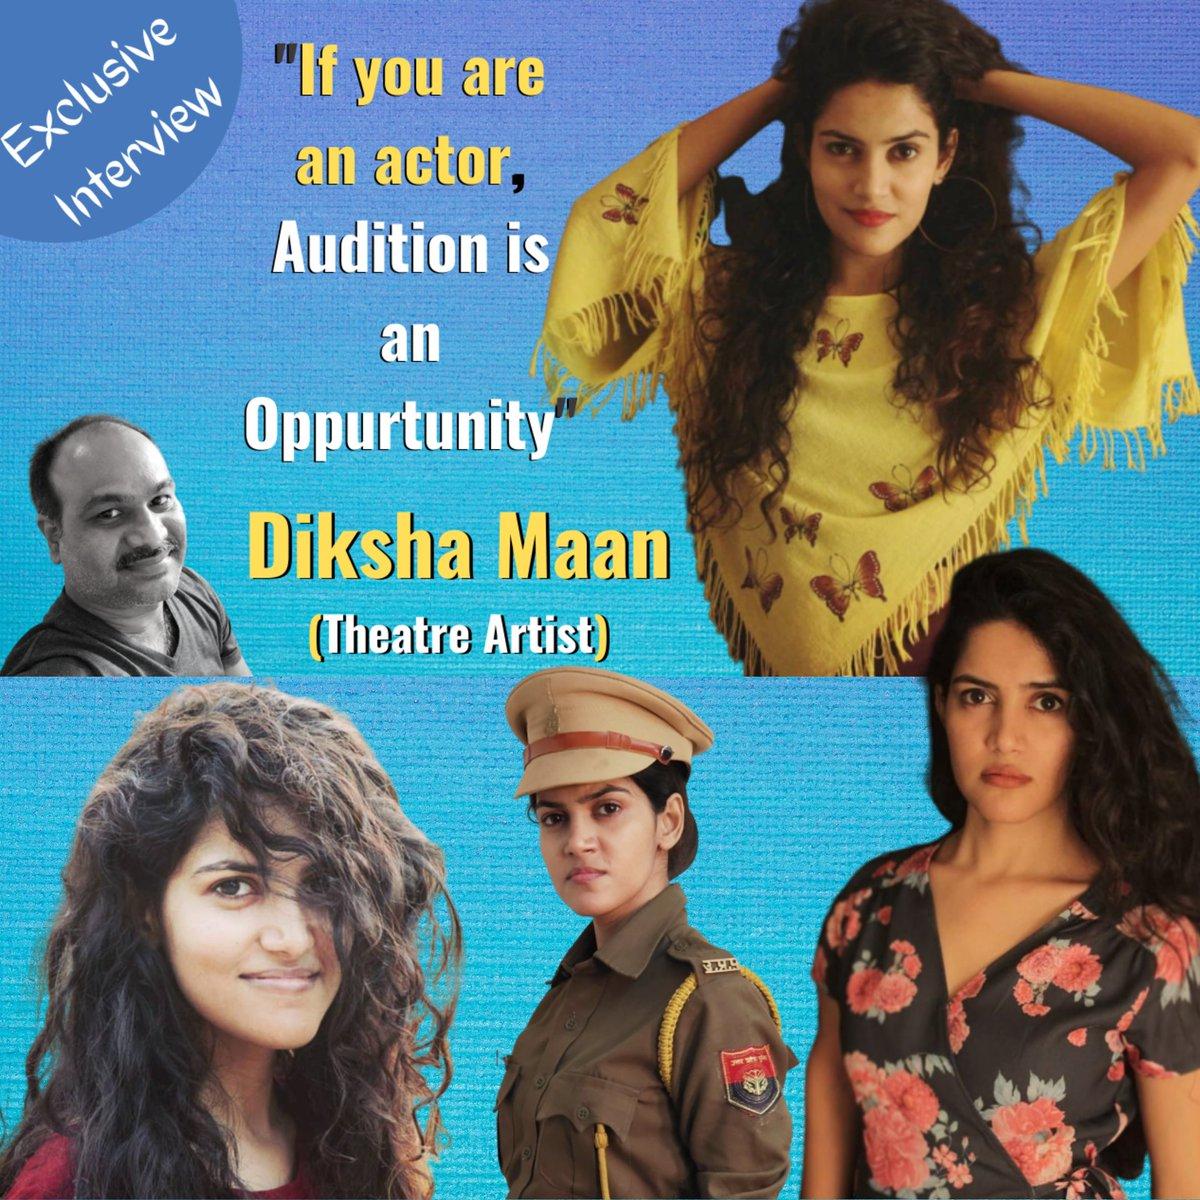 Exclusive interview with Diksha Maan, theatre artist. #dikshamaan #theatreartist #filmartist #onlineinterview #filmactress #IndianActress #bollywoodactress #ActressInterview #IndianCelebrity #Artistinterview #bestofguru #youngartist  https://youtu.be/WryzevAM8HIpic.twitter.com/yg76YoeVUl